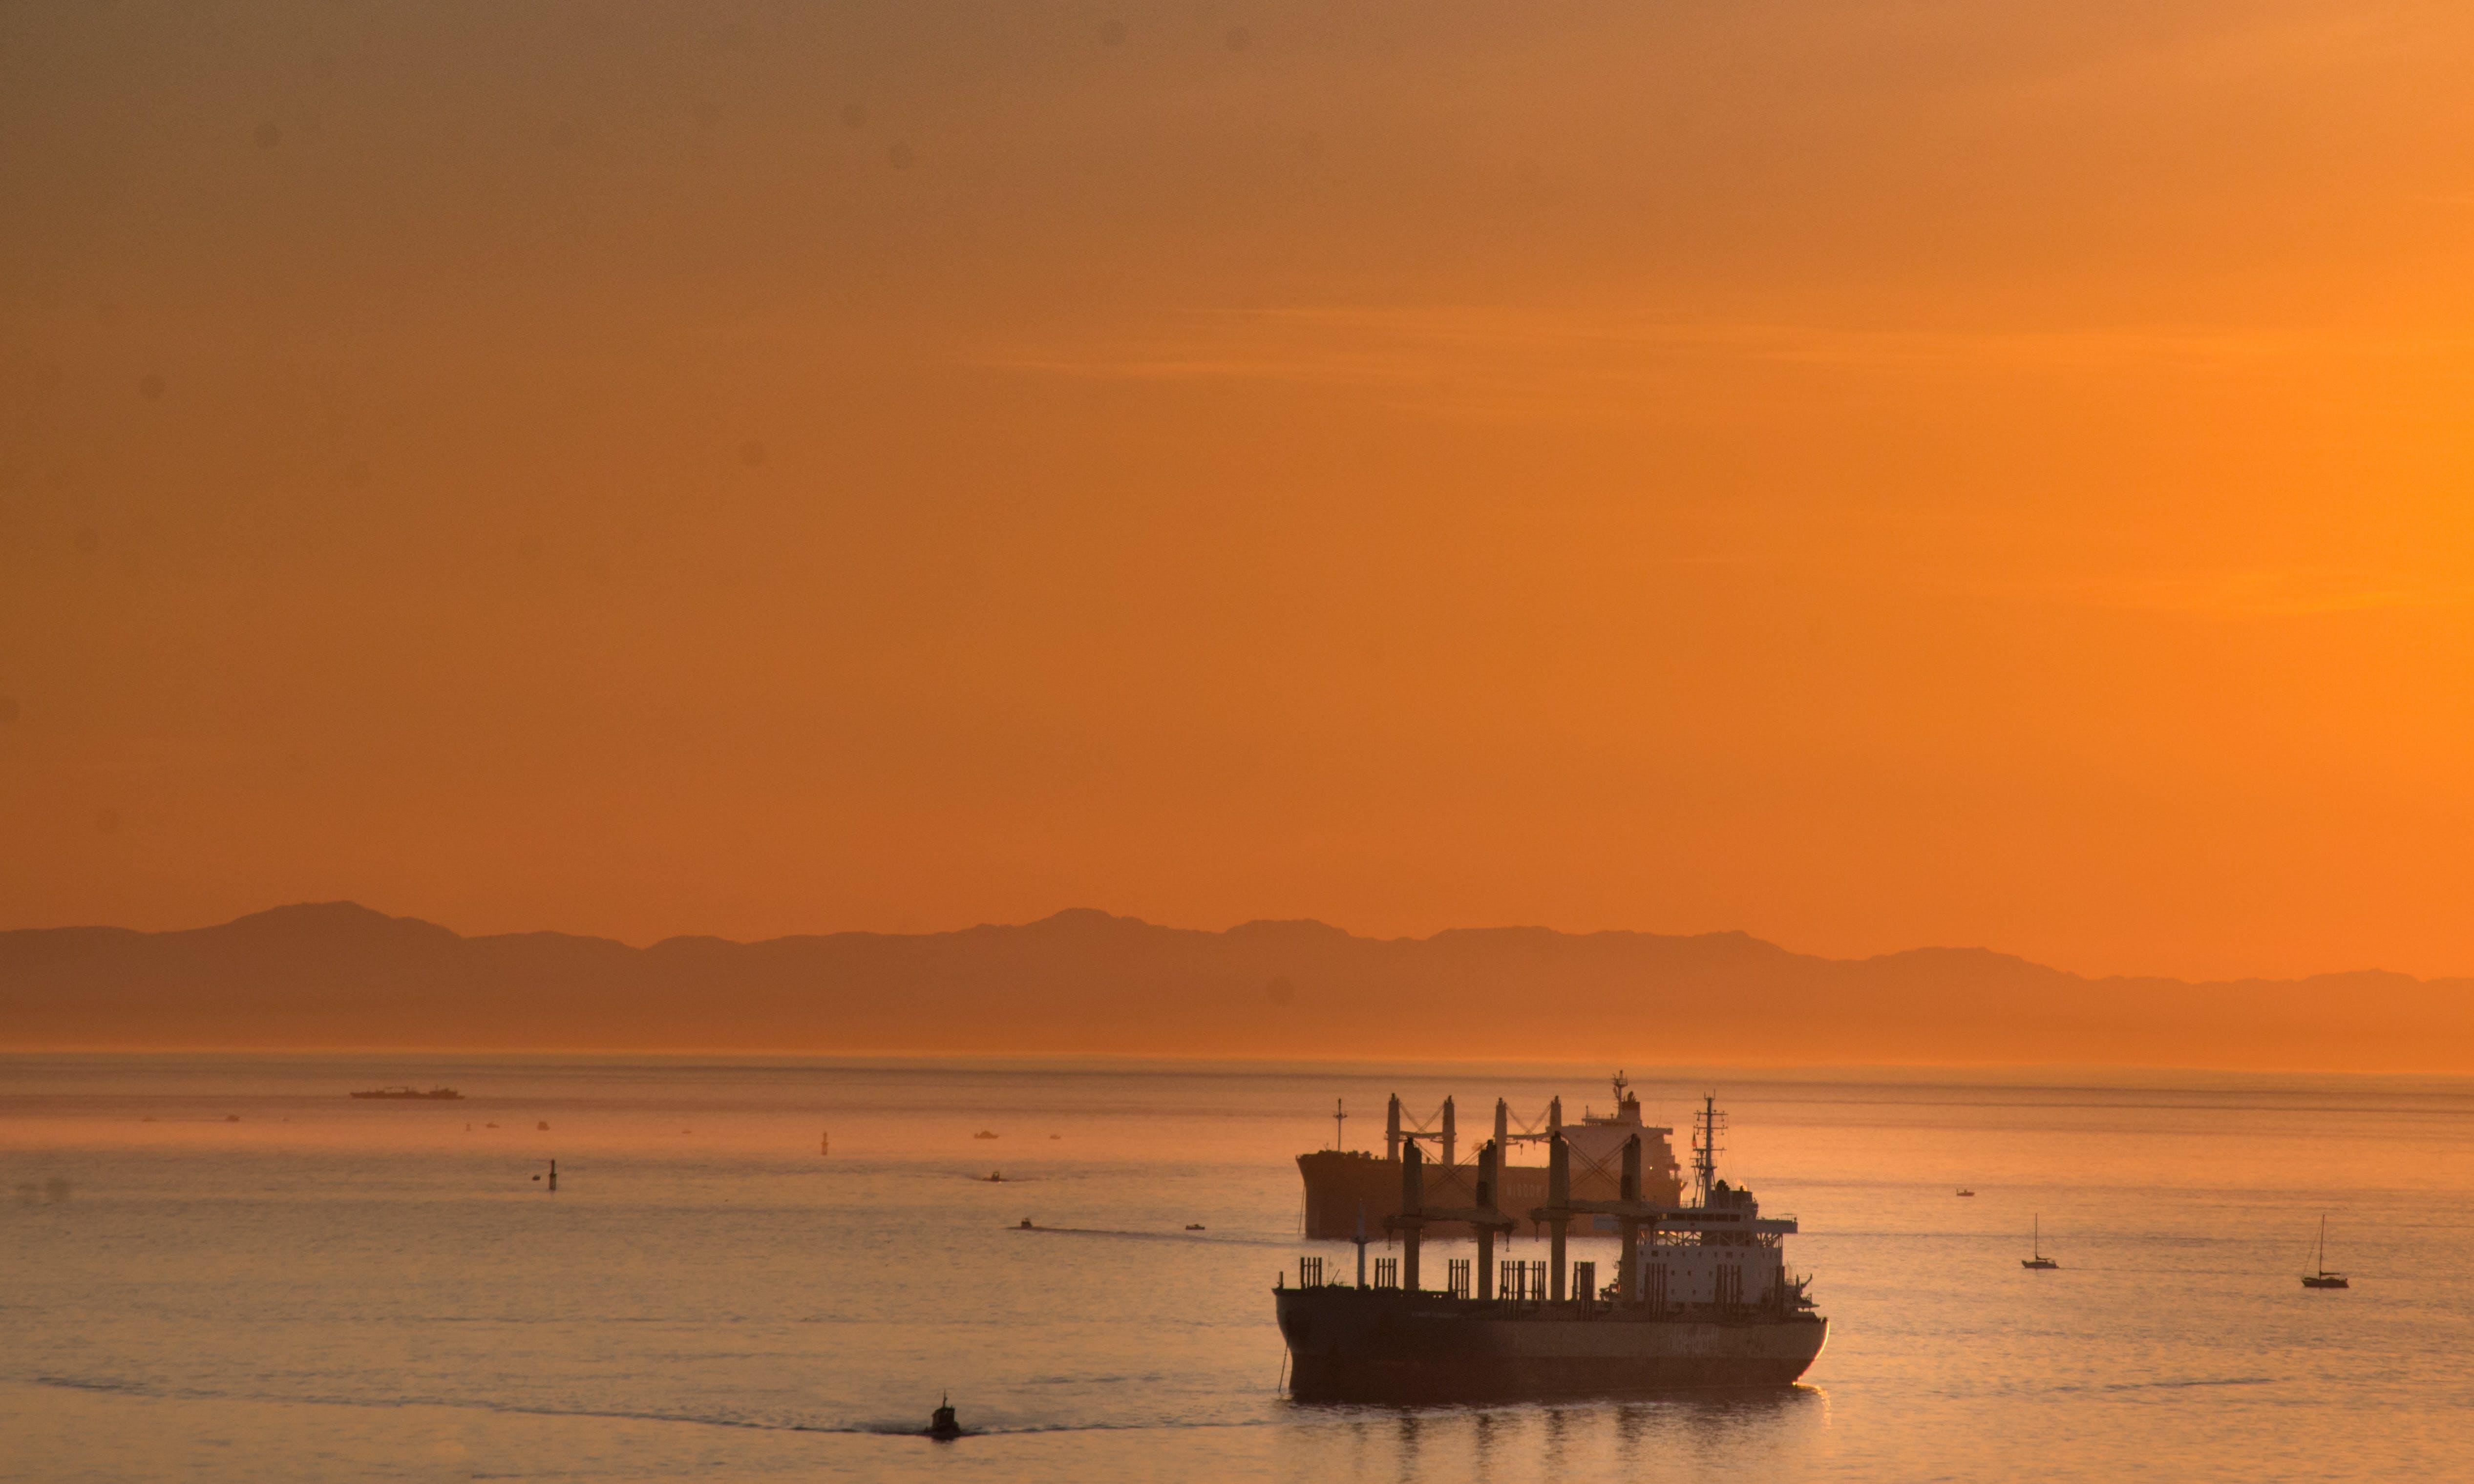 Free stock photo of freighter, ocean, orange sky, sunset